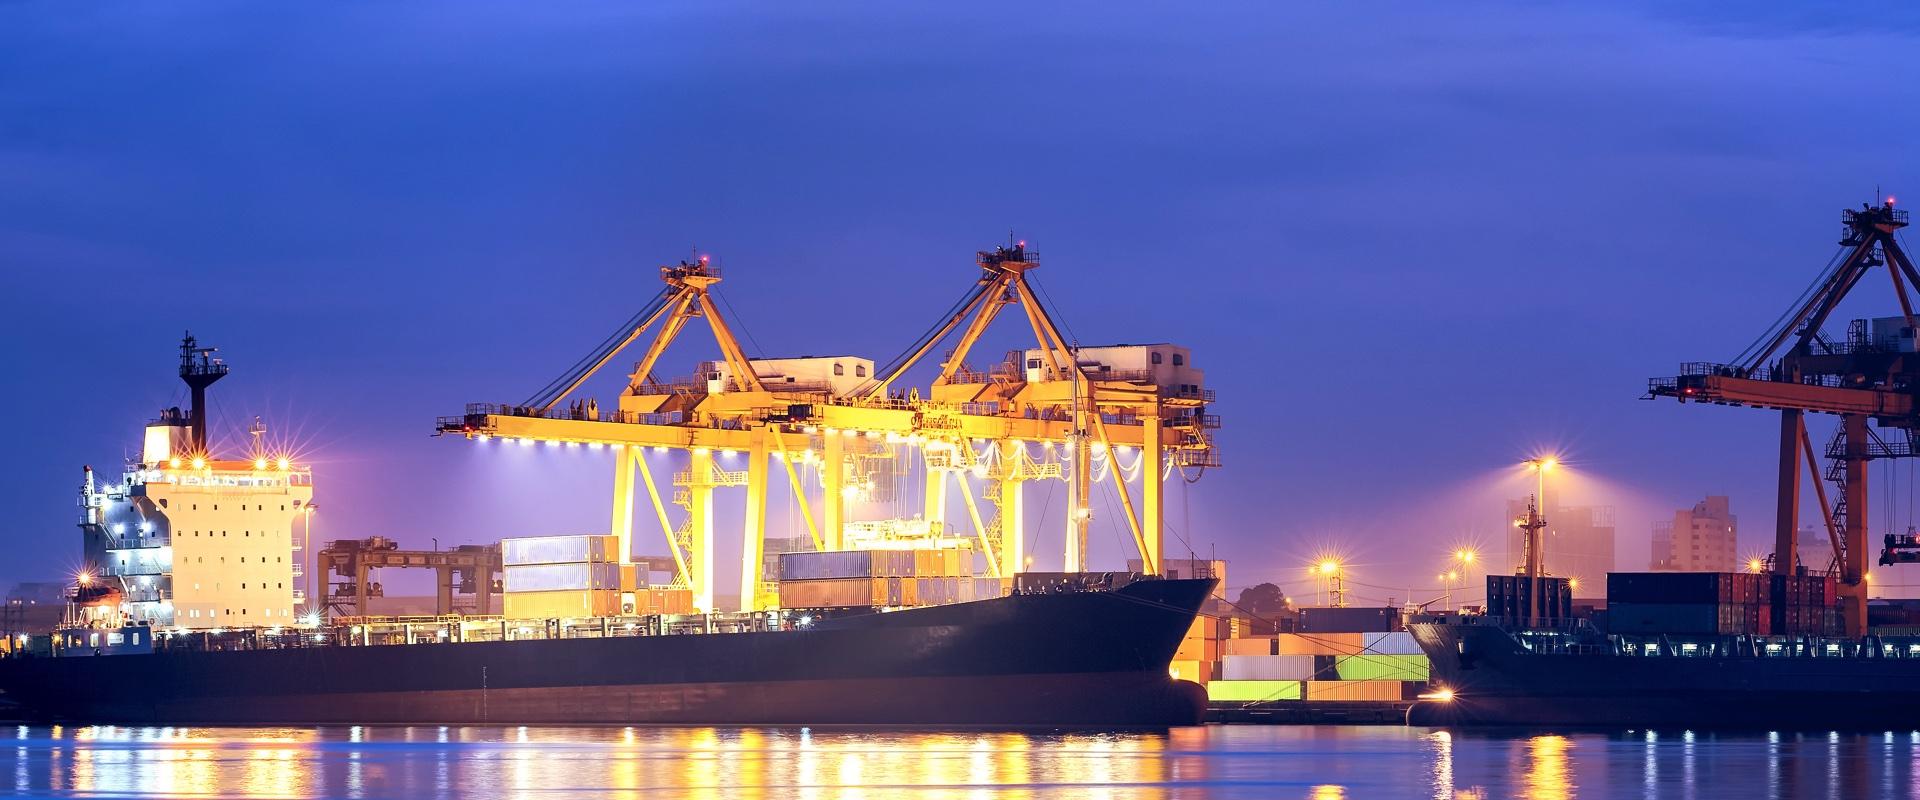 Sector marítimo, imagen de muelle